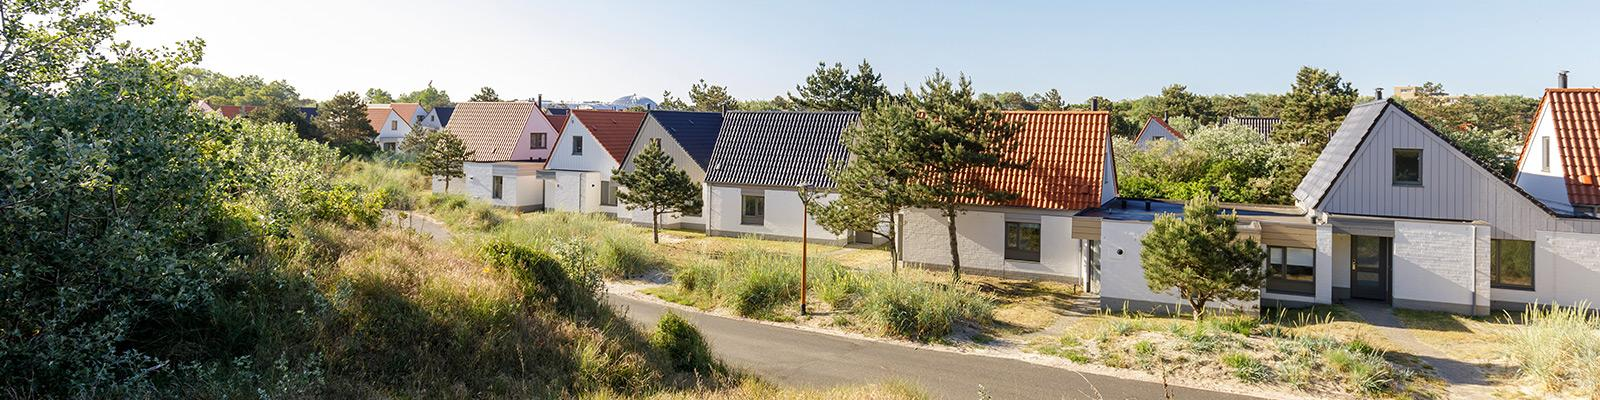 Park Zandvoort